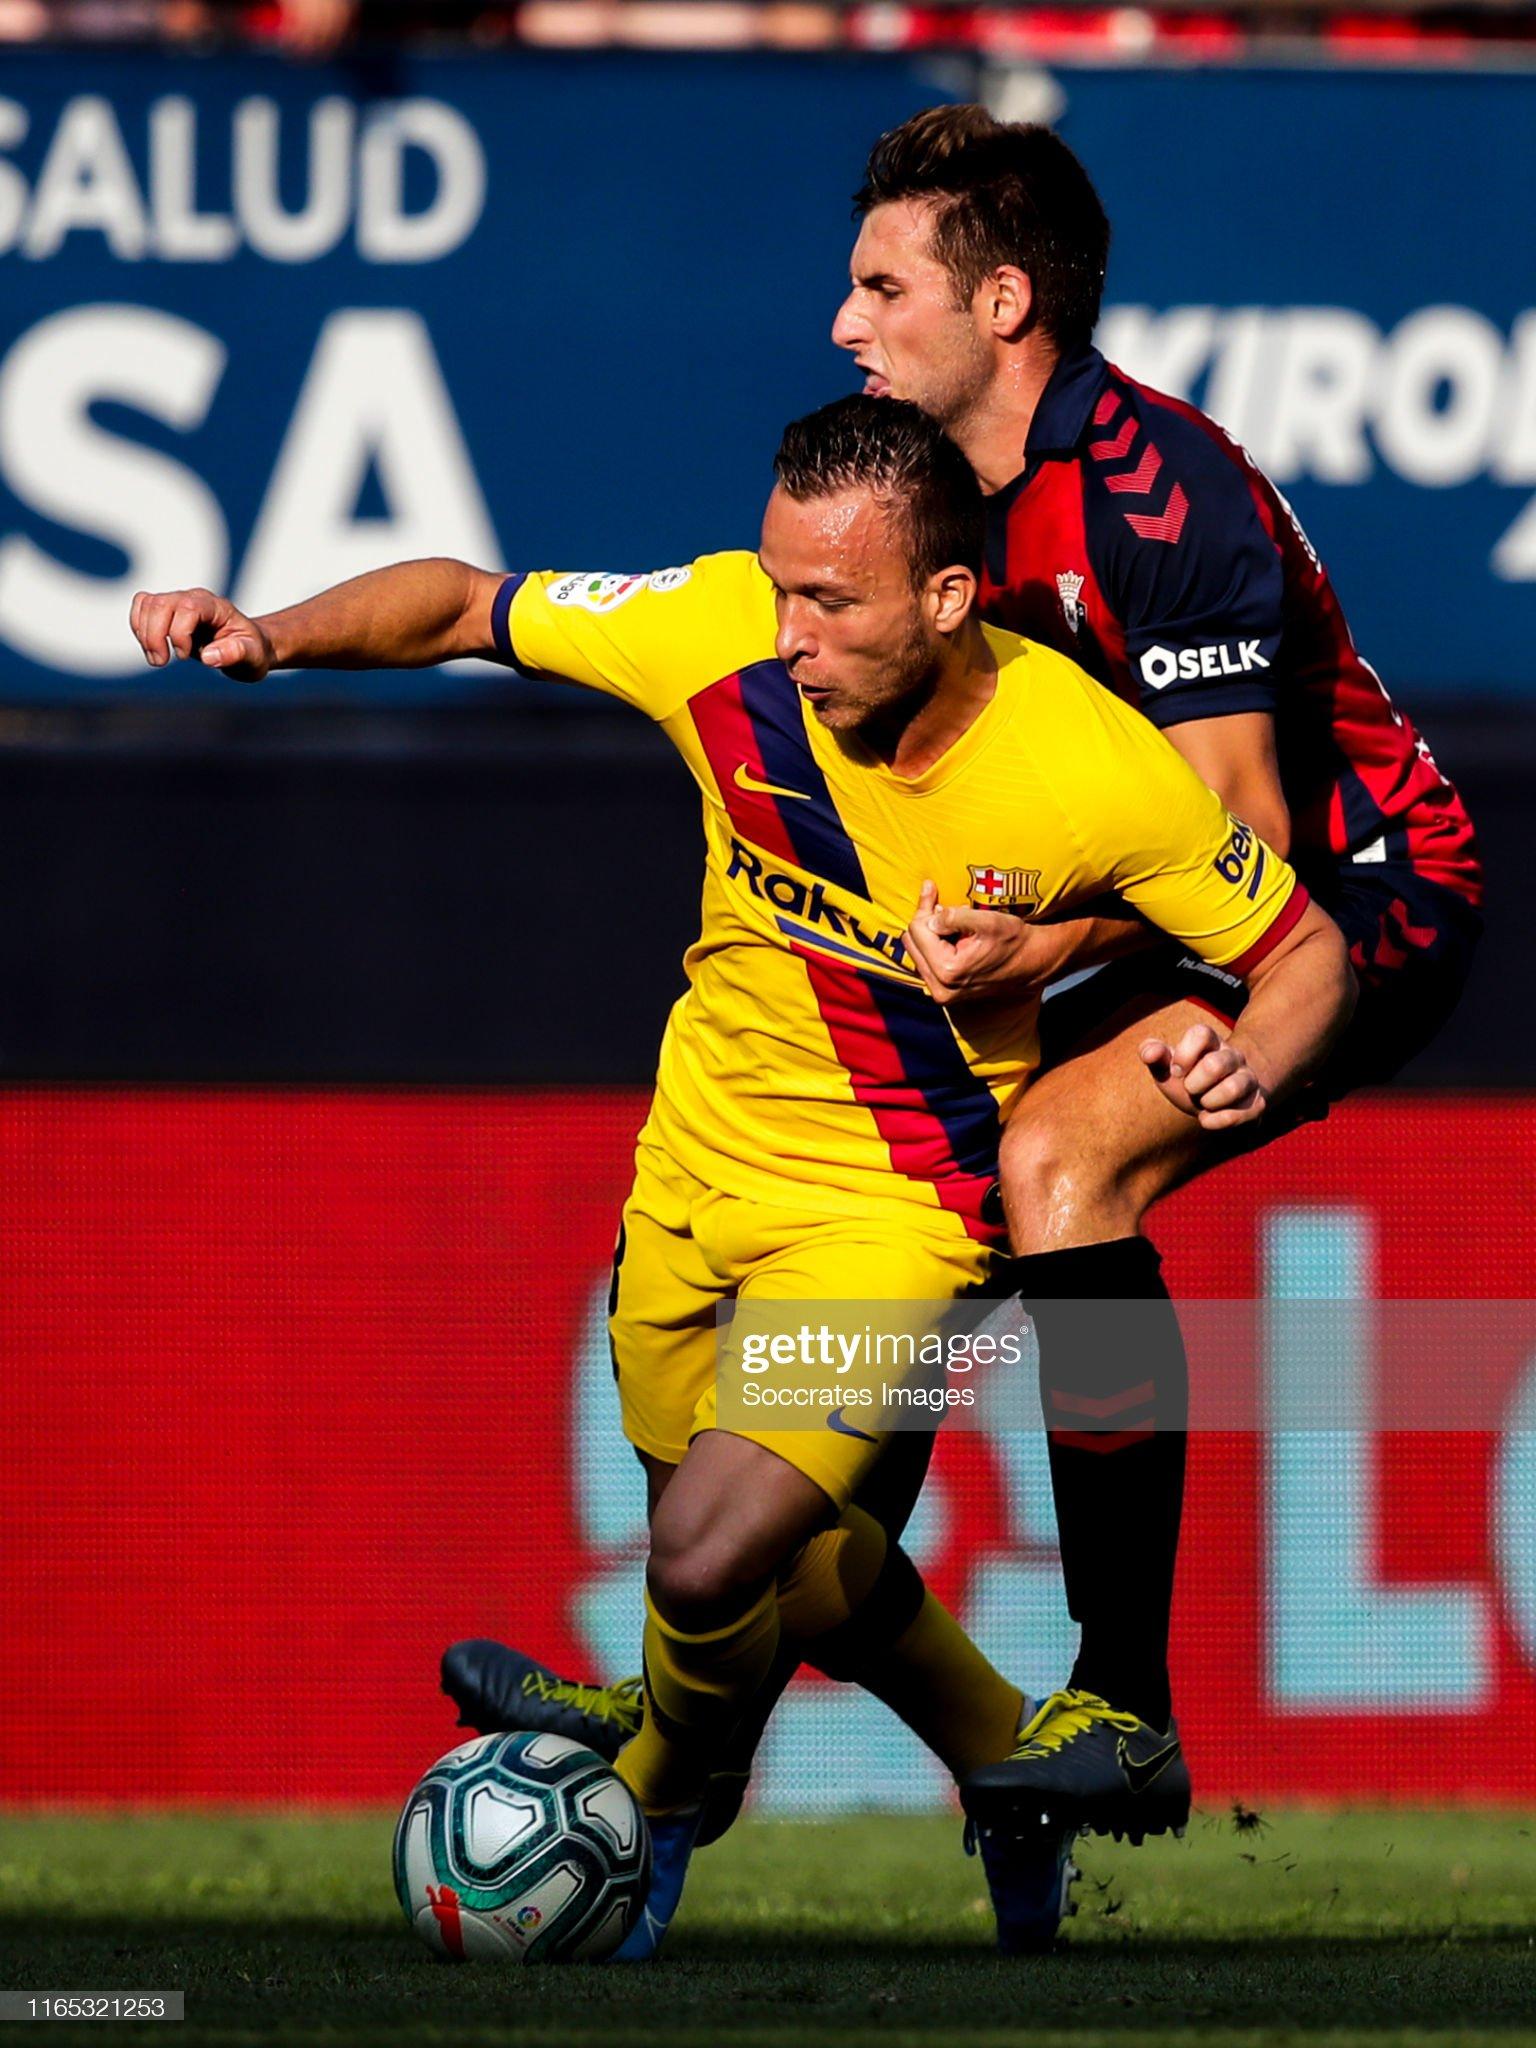 صور مباراة : أوساسونا - برشلونة 2-2 ( 31-08-2019 )  Arthur-of-fc-barcelona-nacho-vidal-of-ca-osasuna-during-the-la-liga-picture-id1165321253?s=2048x2048